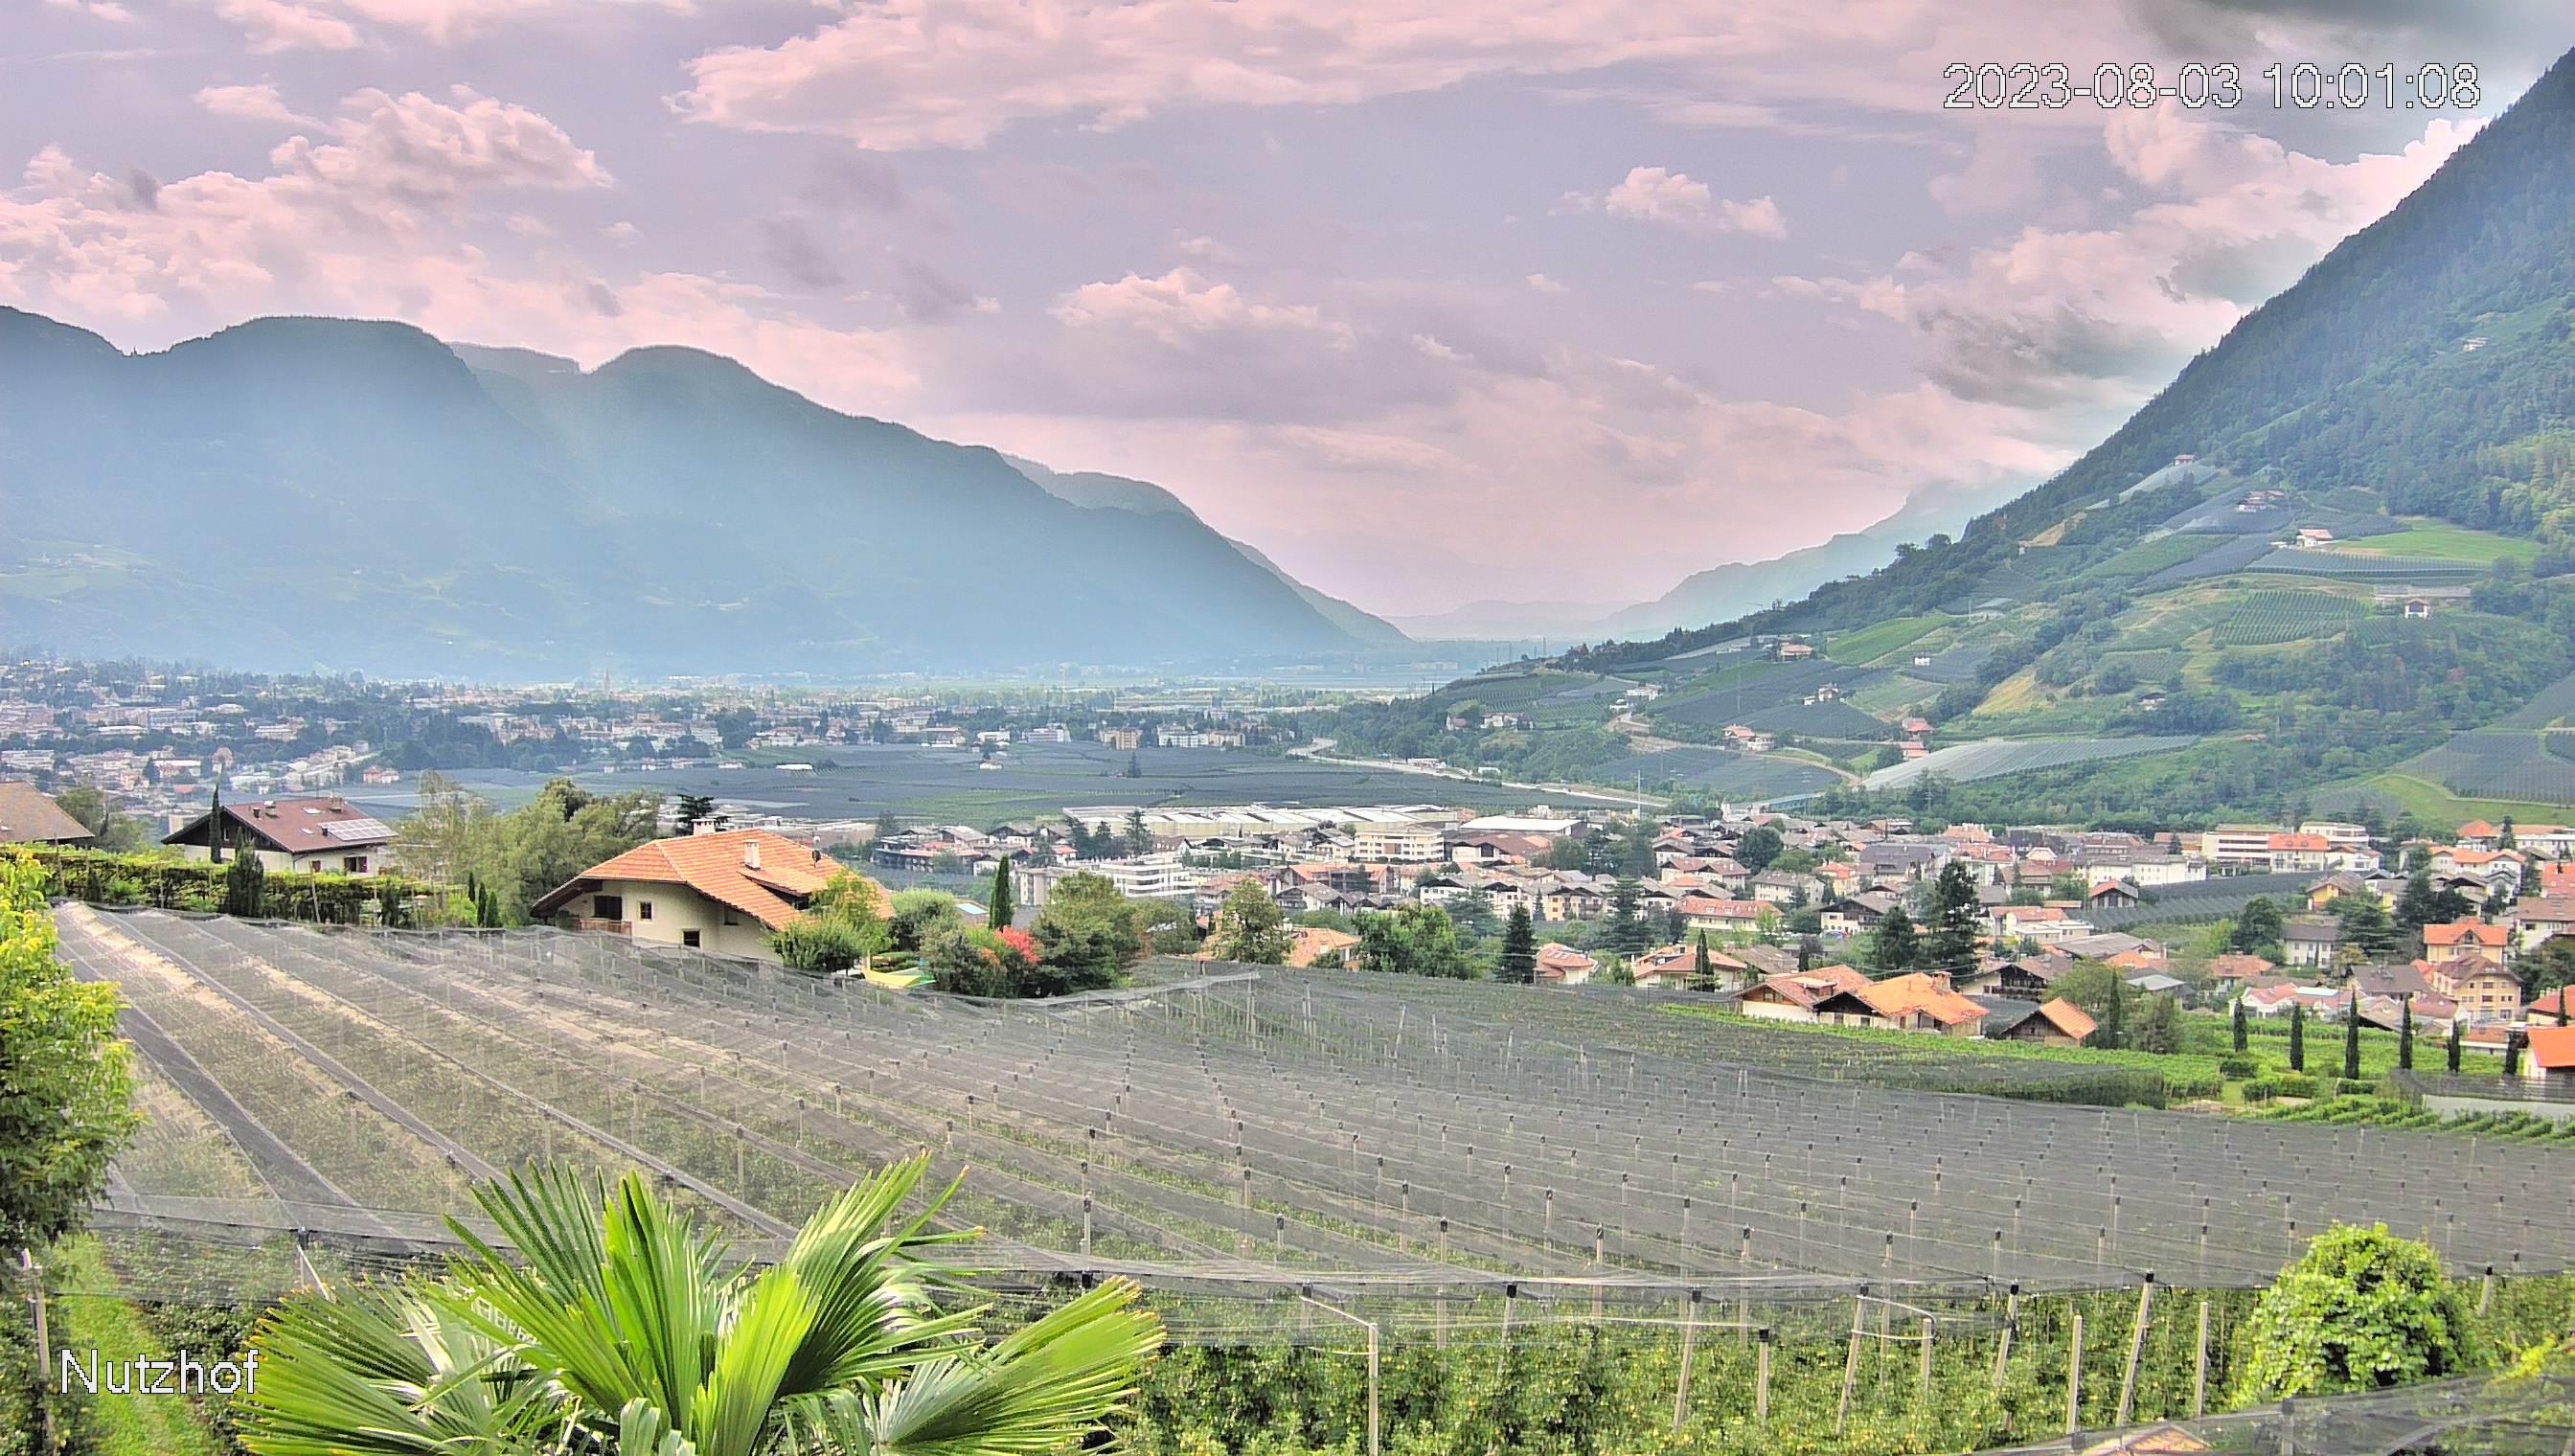 Webcam Nutzhof